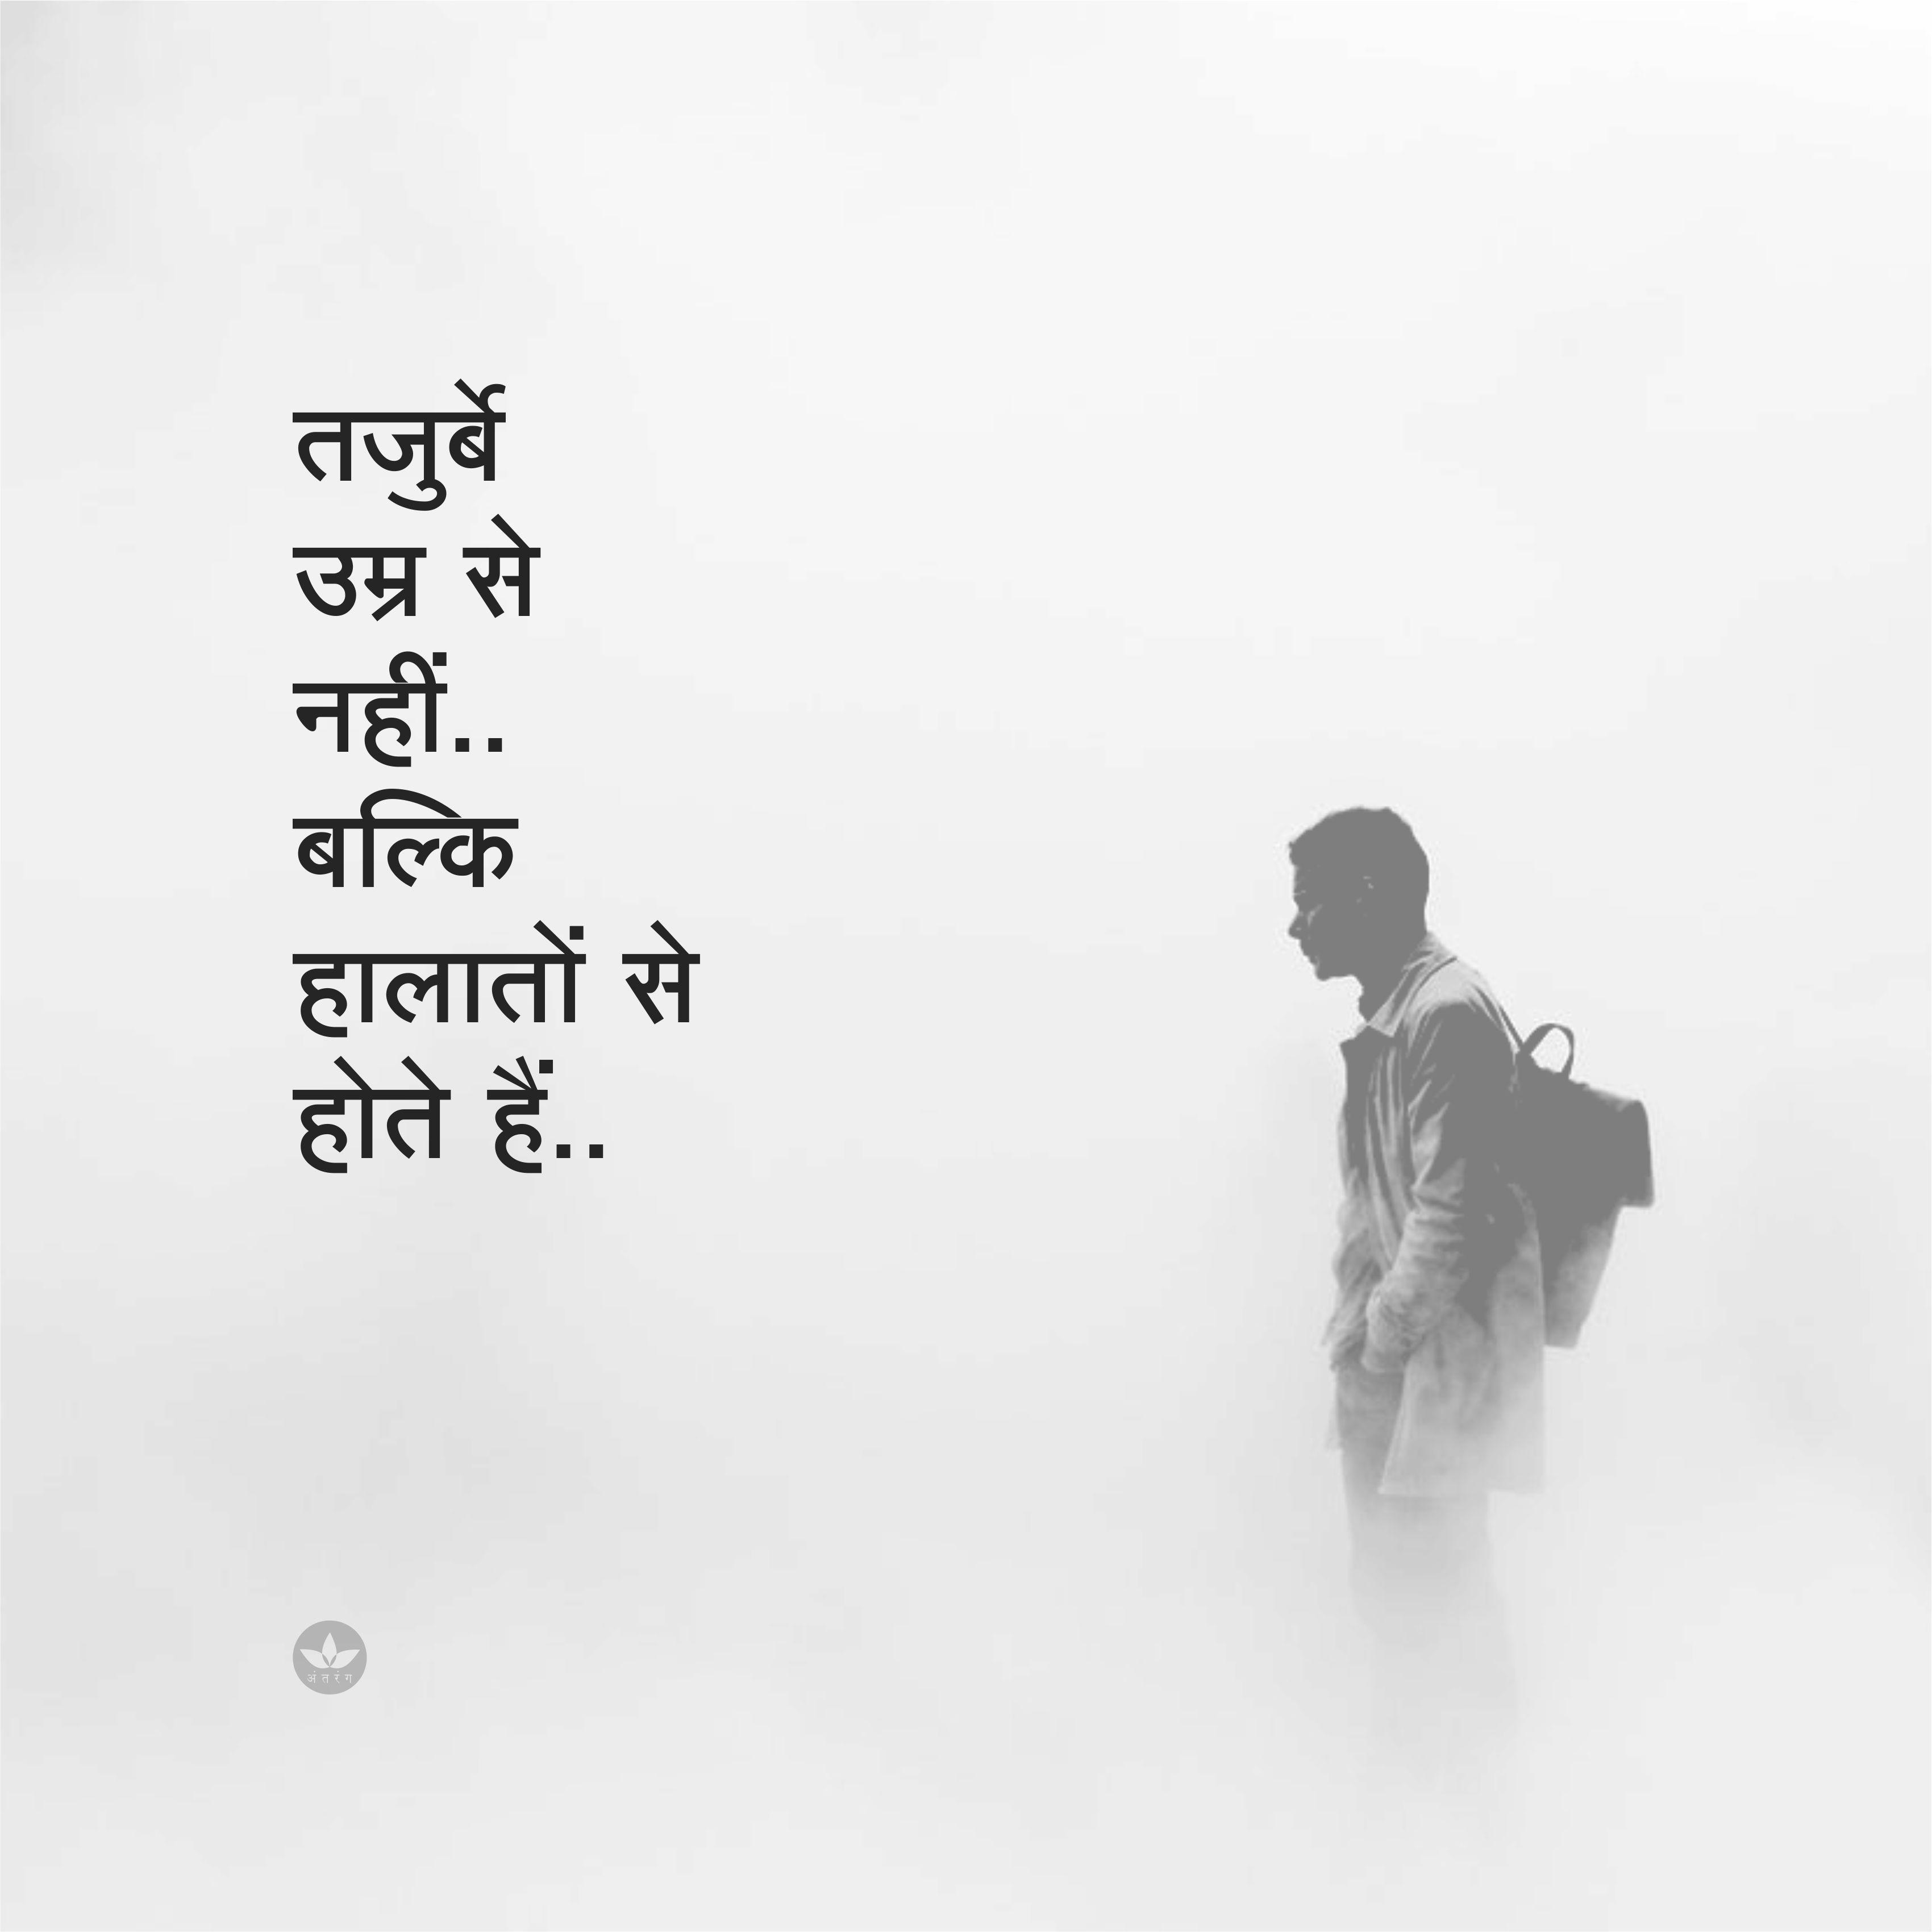 Pin by Nilesh Gitay on Shayari Life quotes, Memories